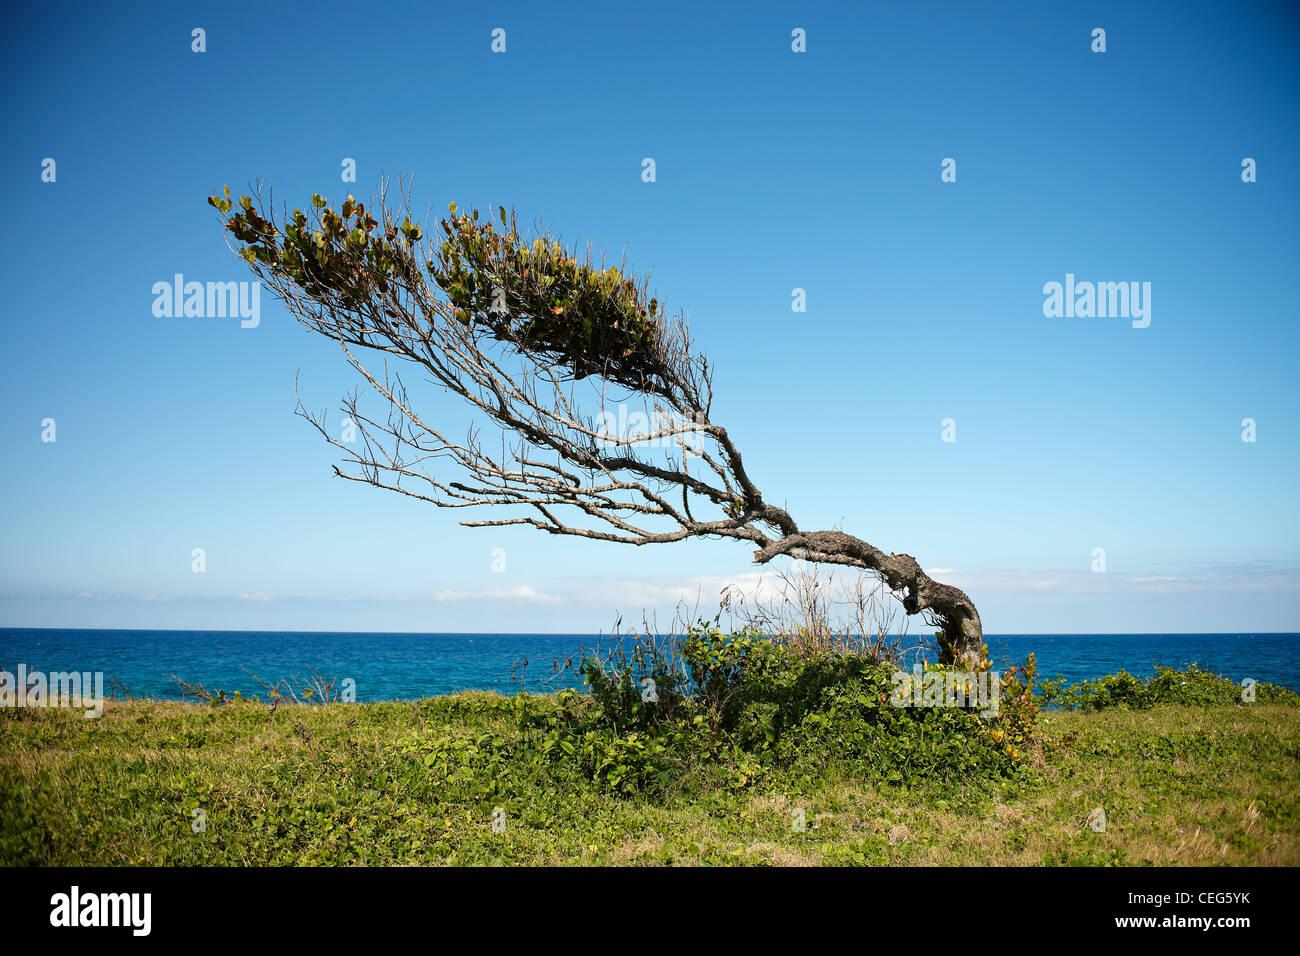 windswept tree on the Jamaican coast - Stock Image